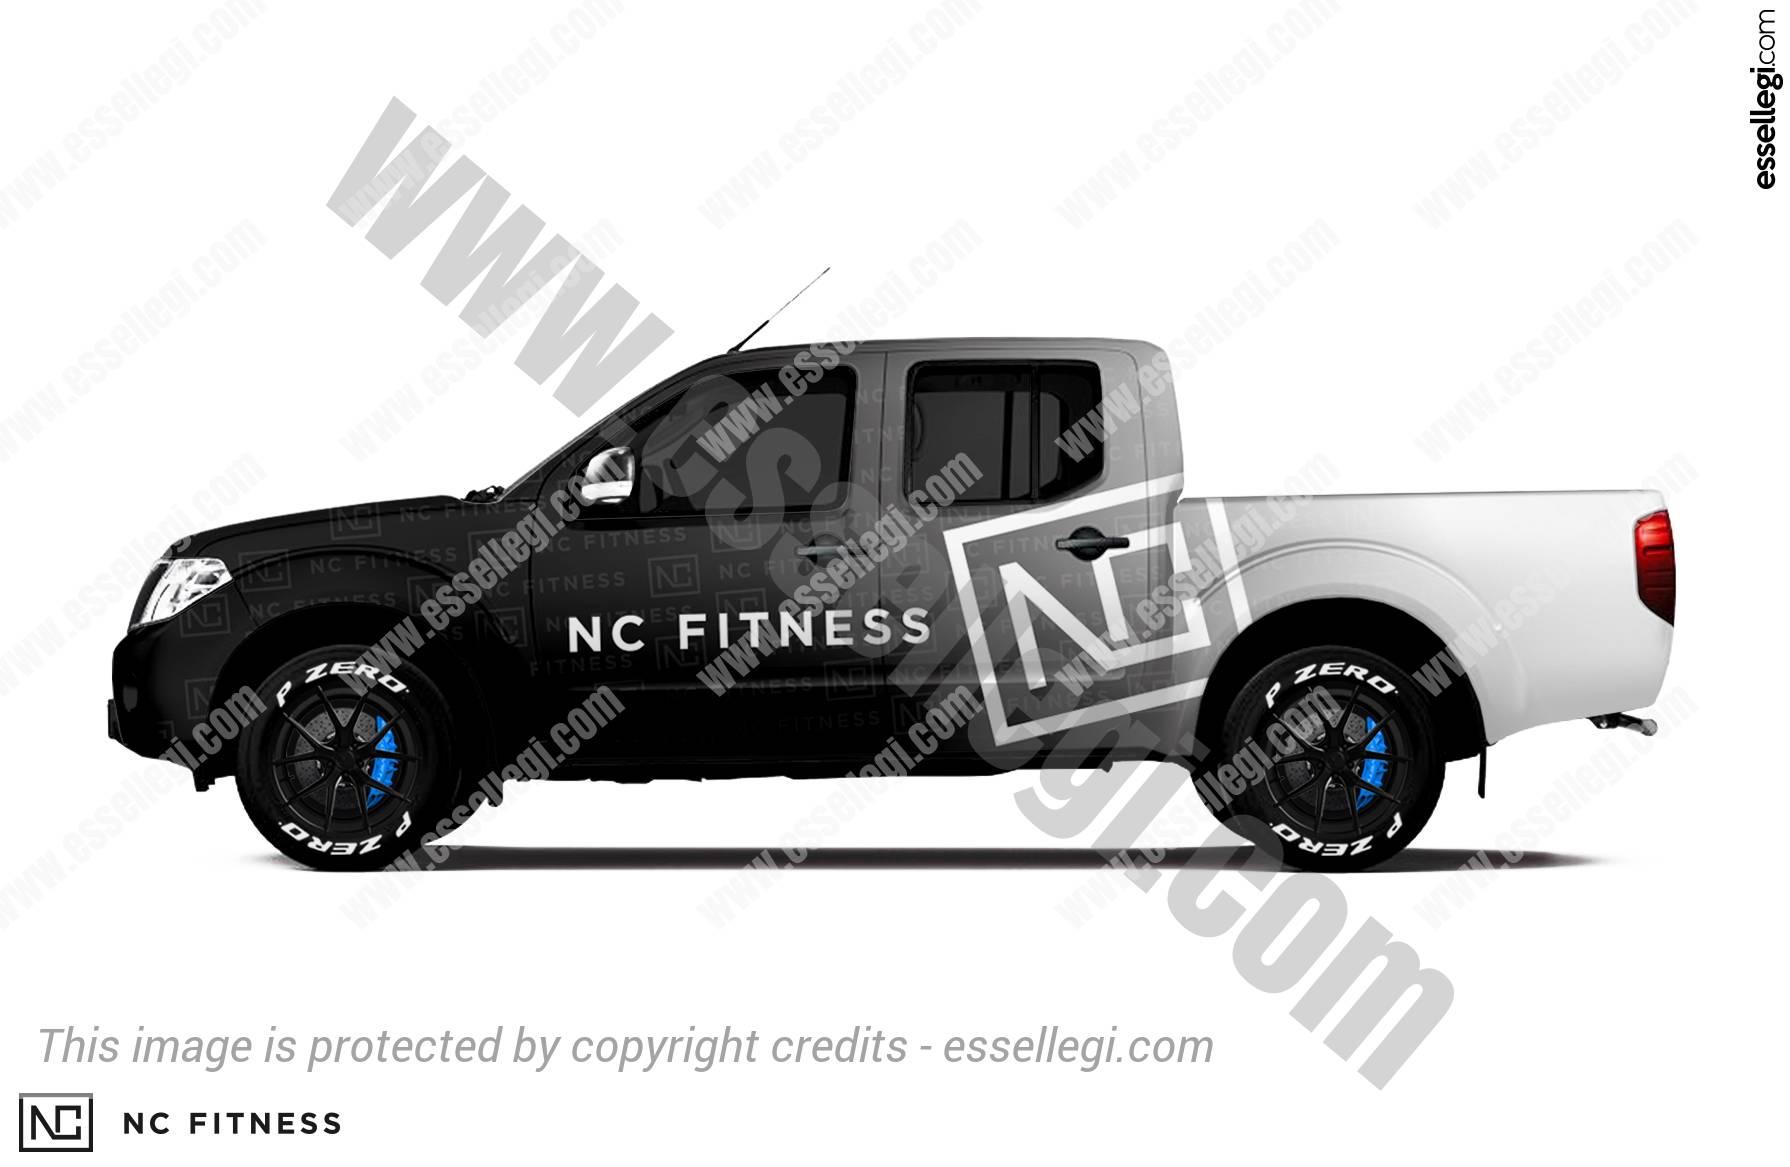 NC FITNESS | TRUCK WRAP DESIGN 🇦🇺